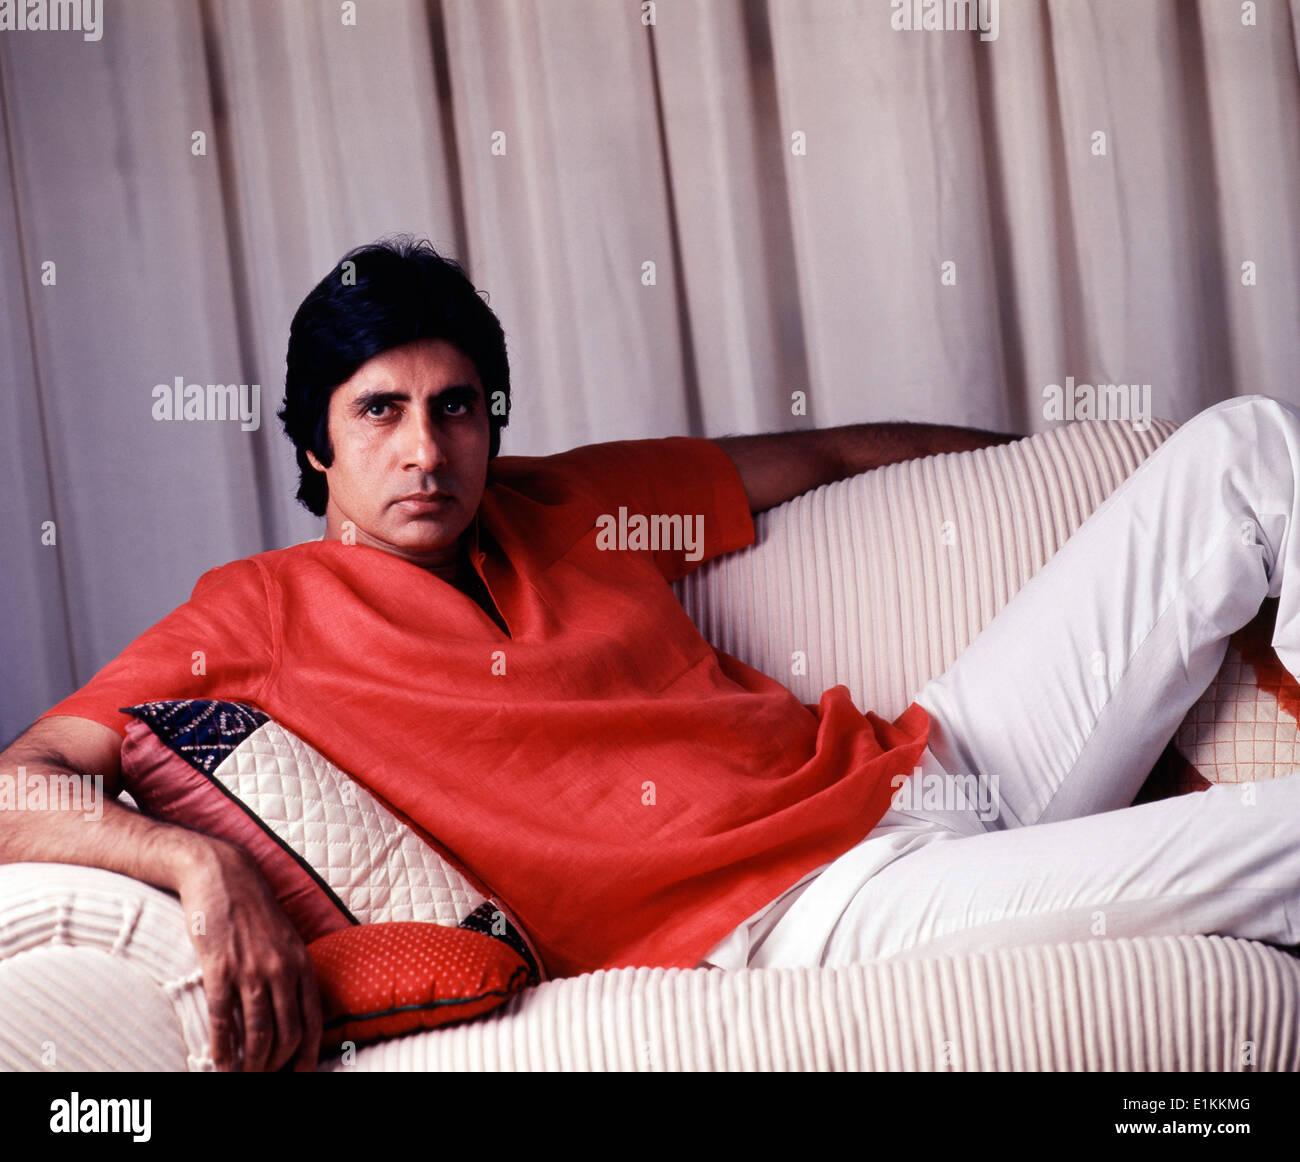 Amitabh Bachchan Indian bollywood actor sitting on sofa 1987 - Stock Image